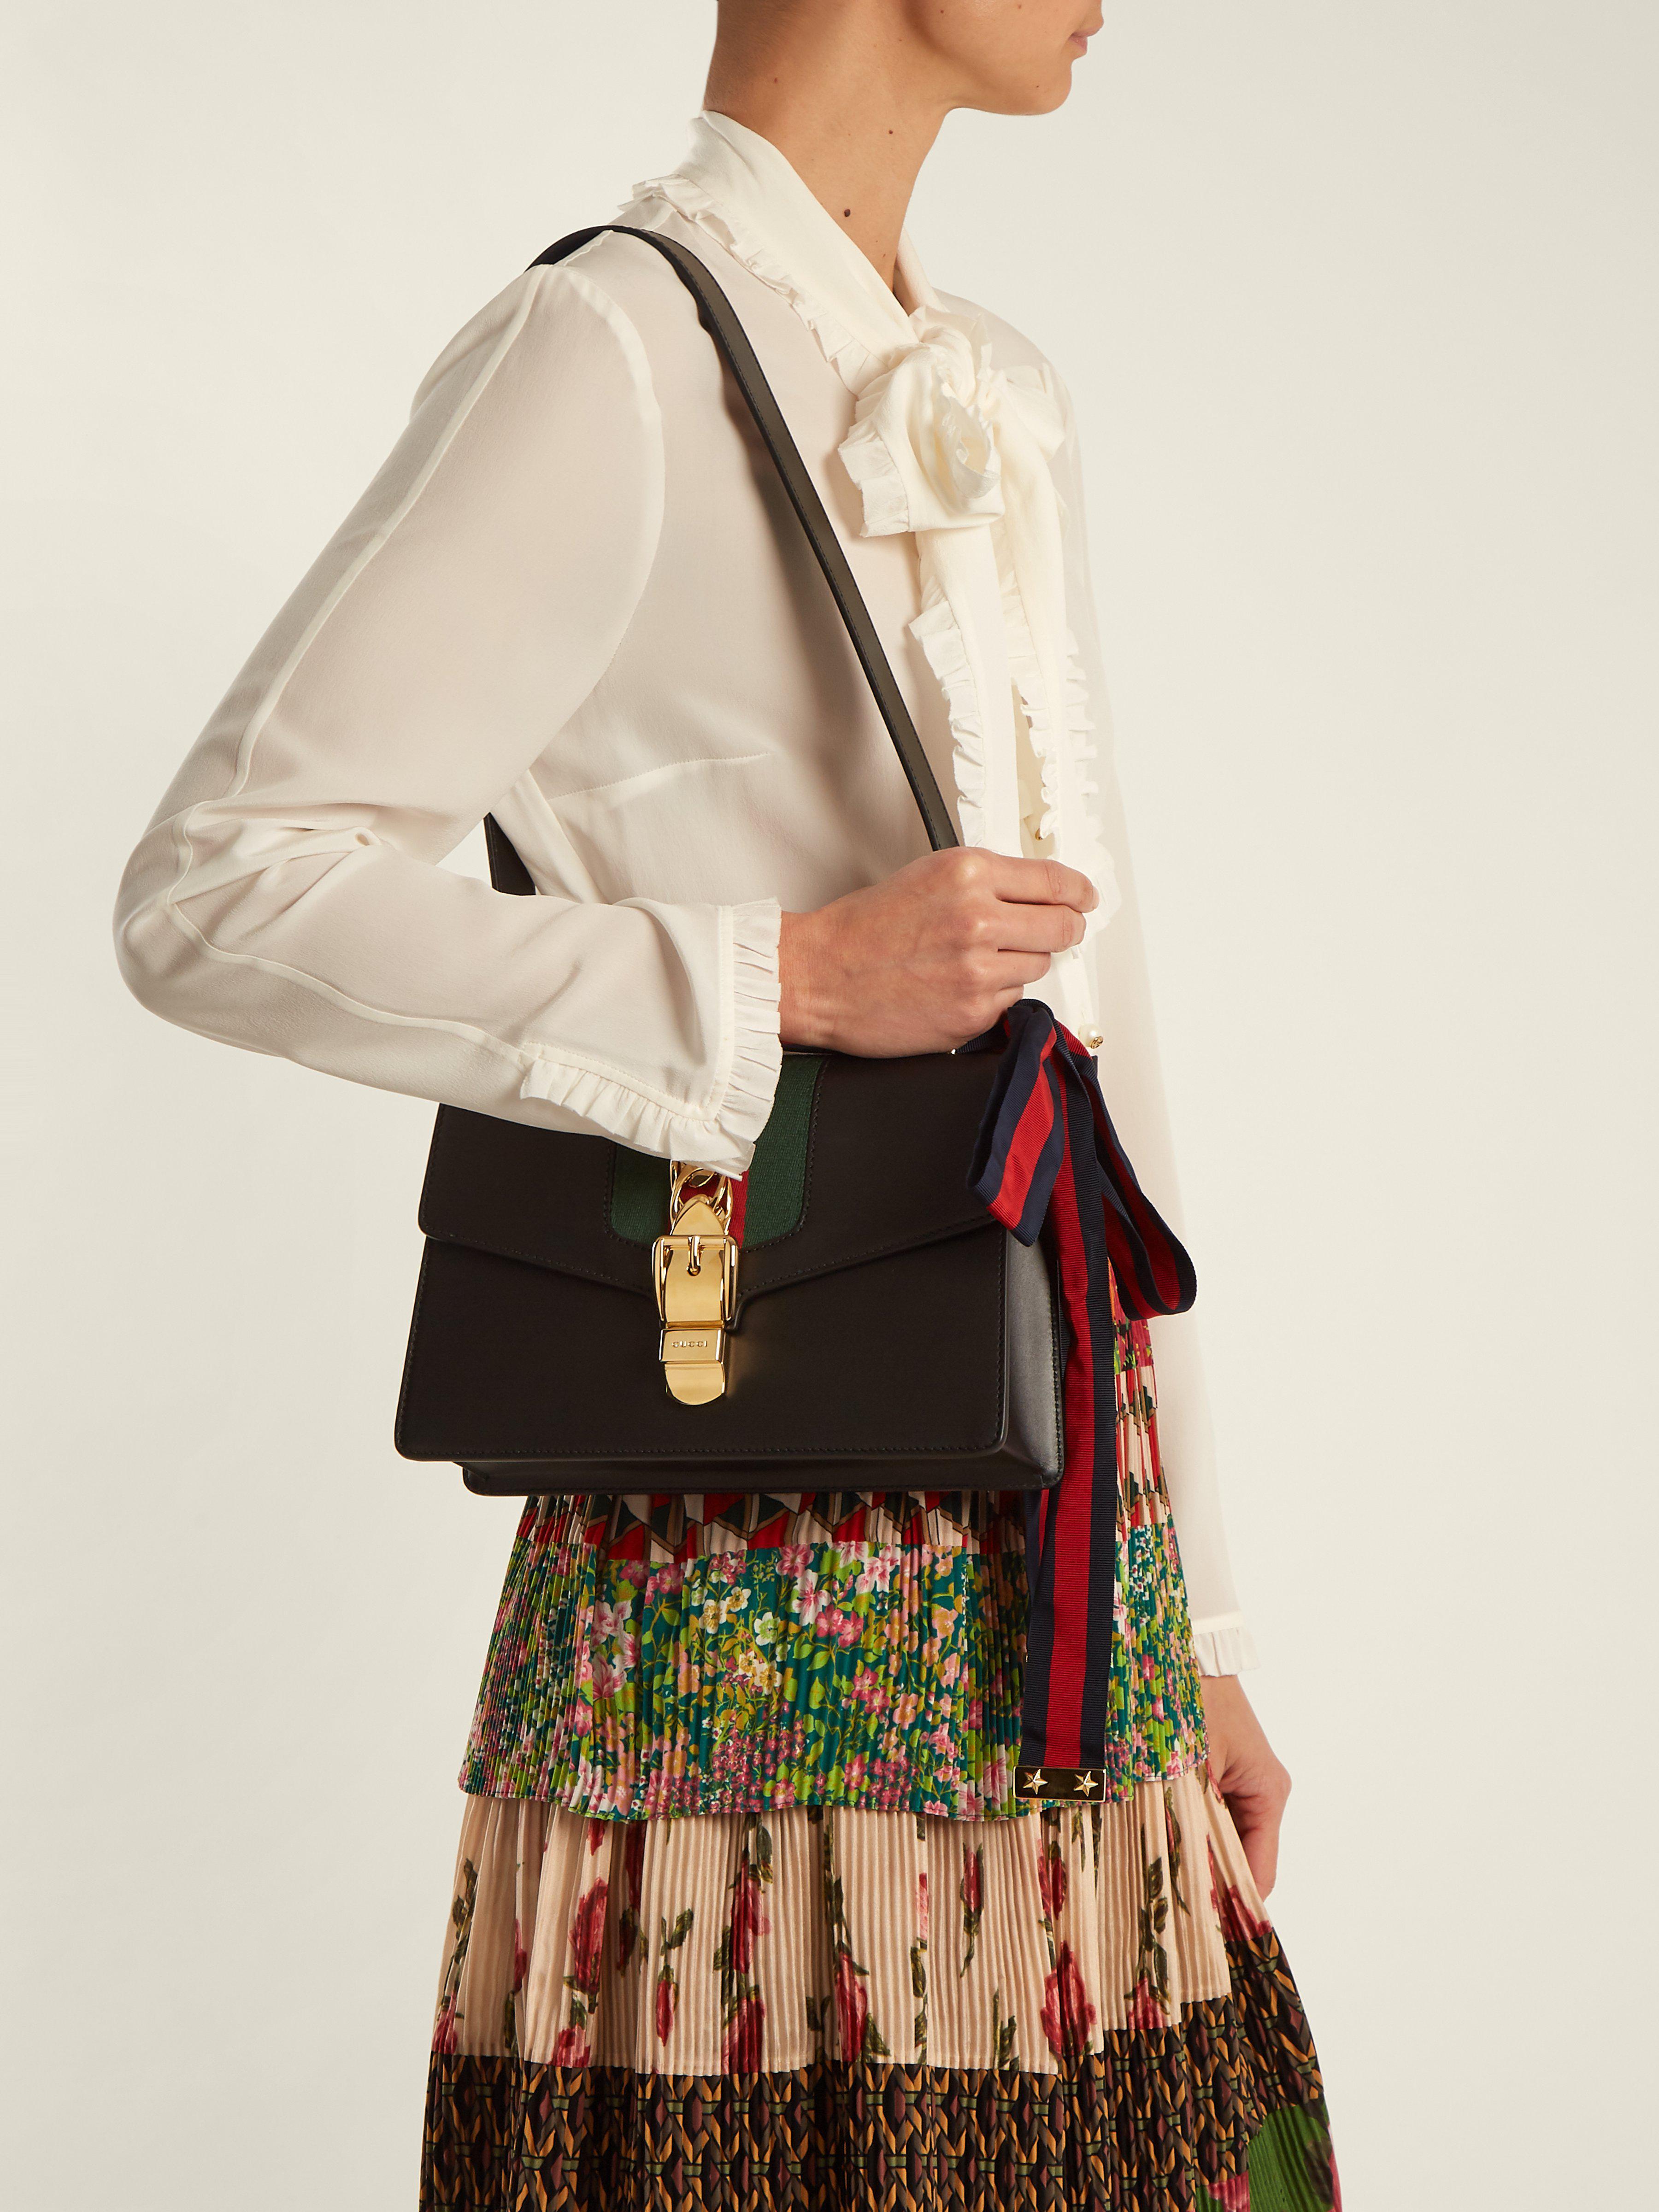 82cfe331290d38 Gucci Sylvie Leather Shoulder Bag in Black - Save 23% - Lyst